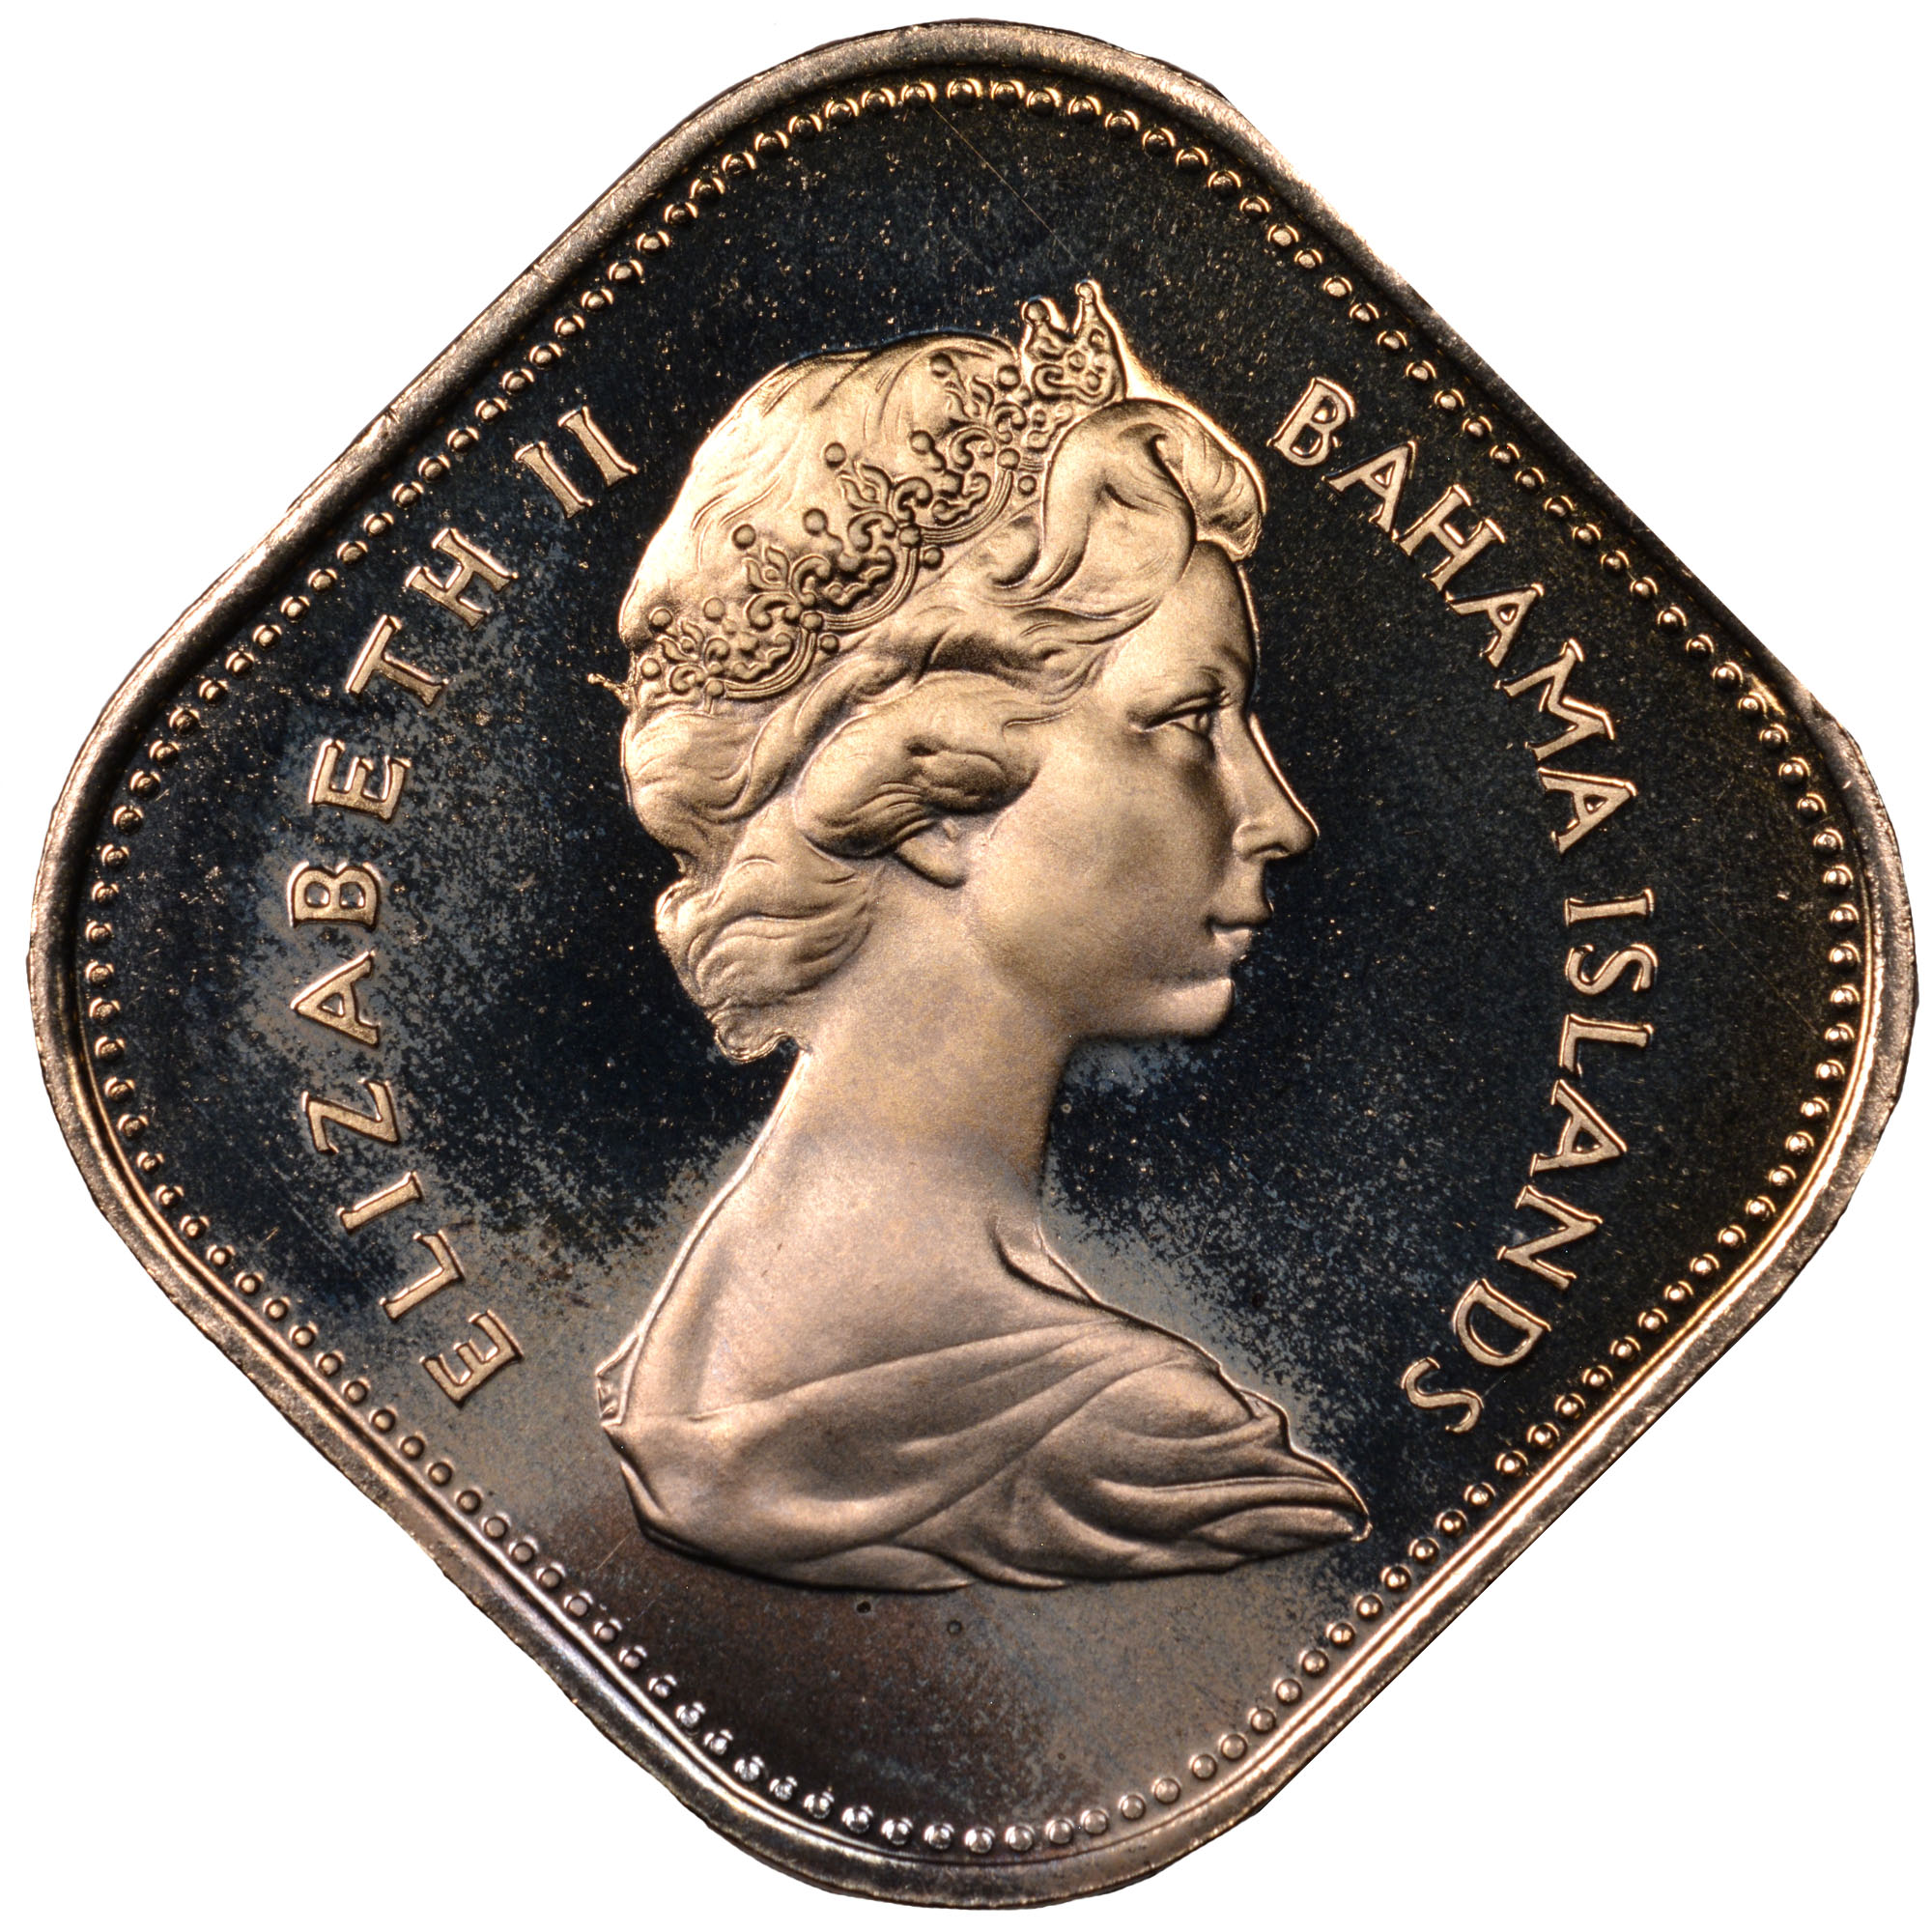 1966-1970 Bahamas 15 Cents obverse